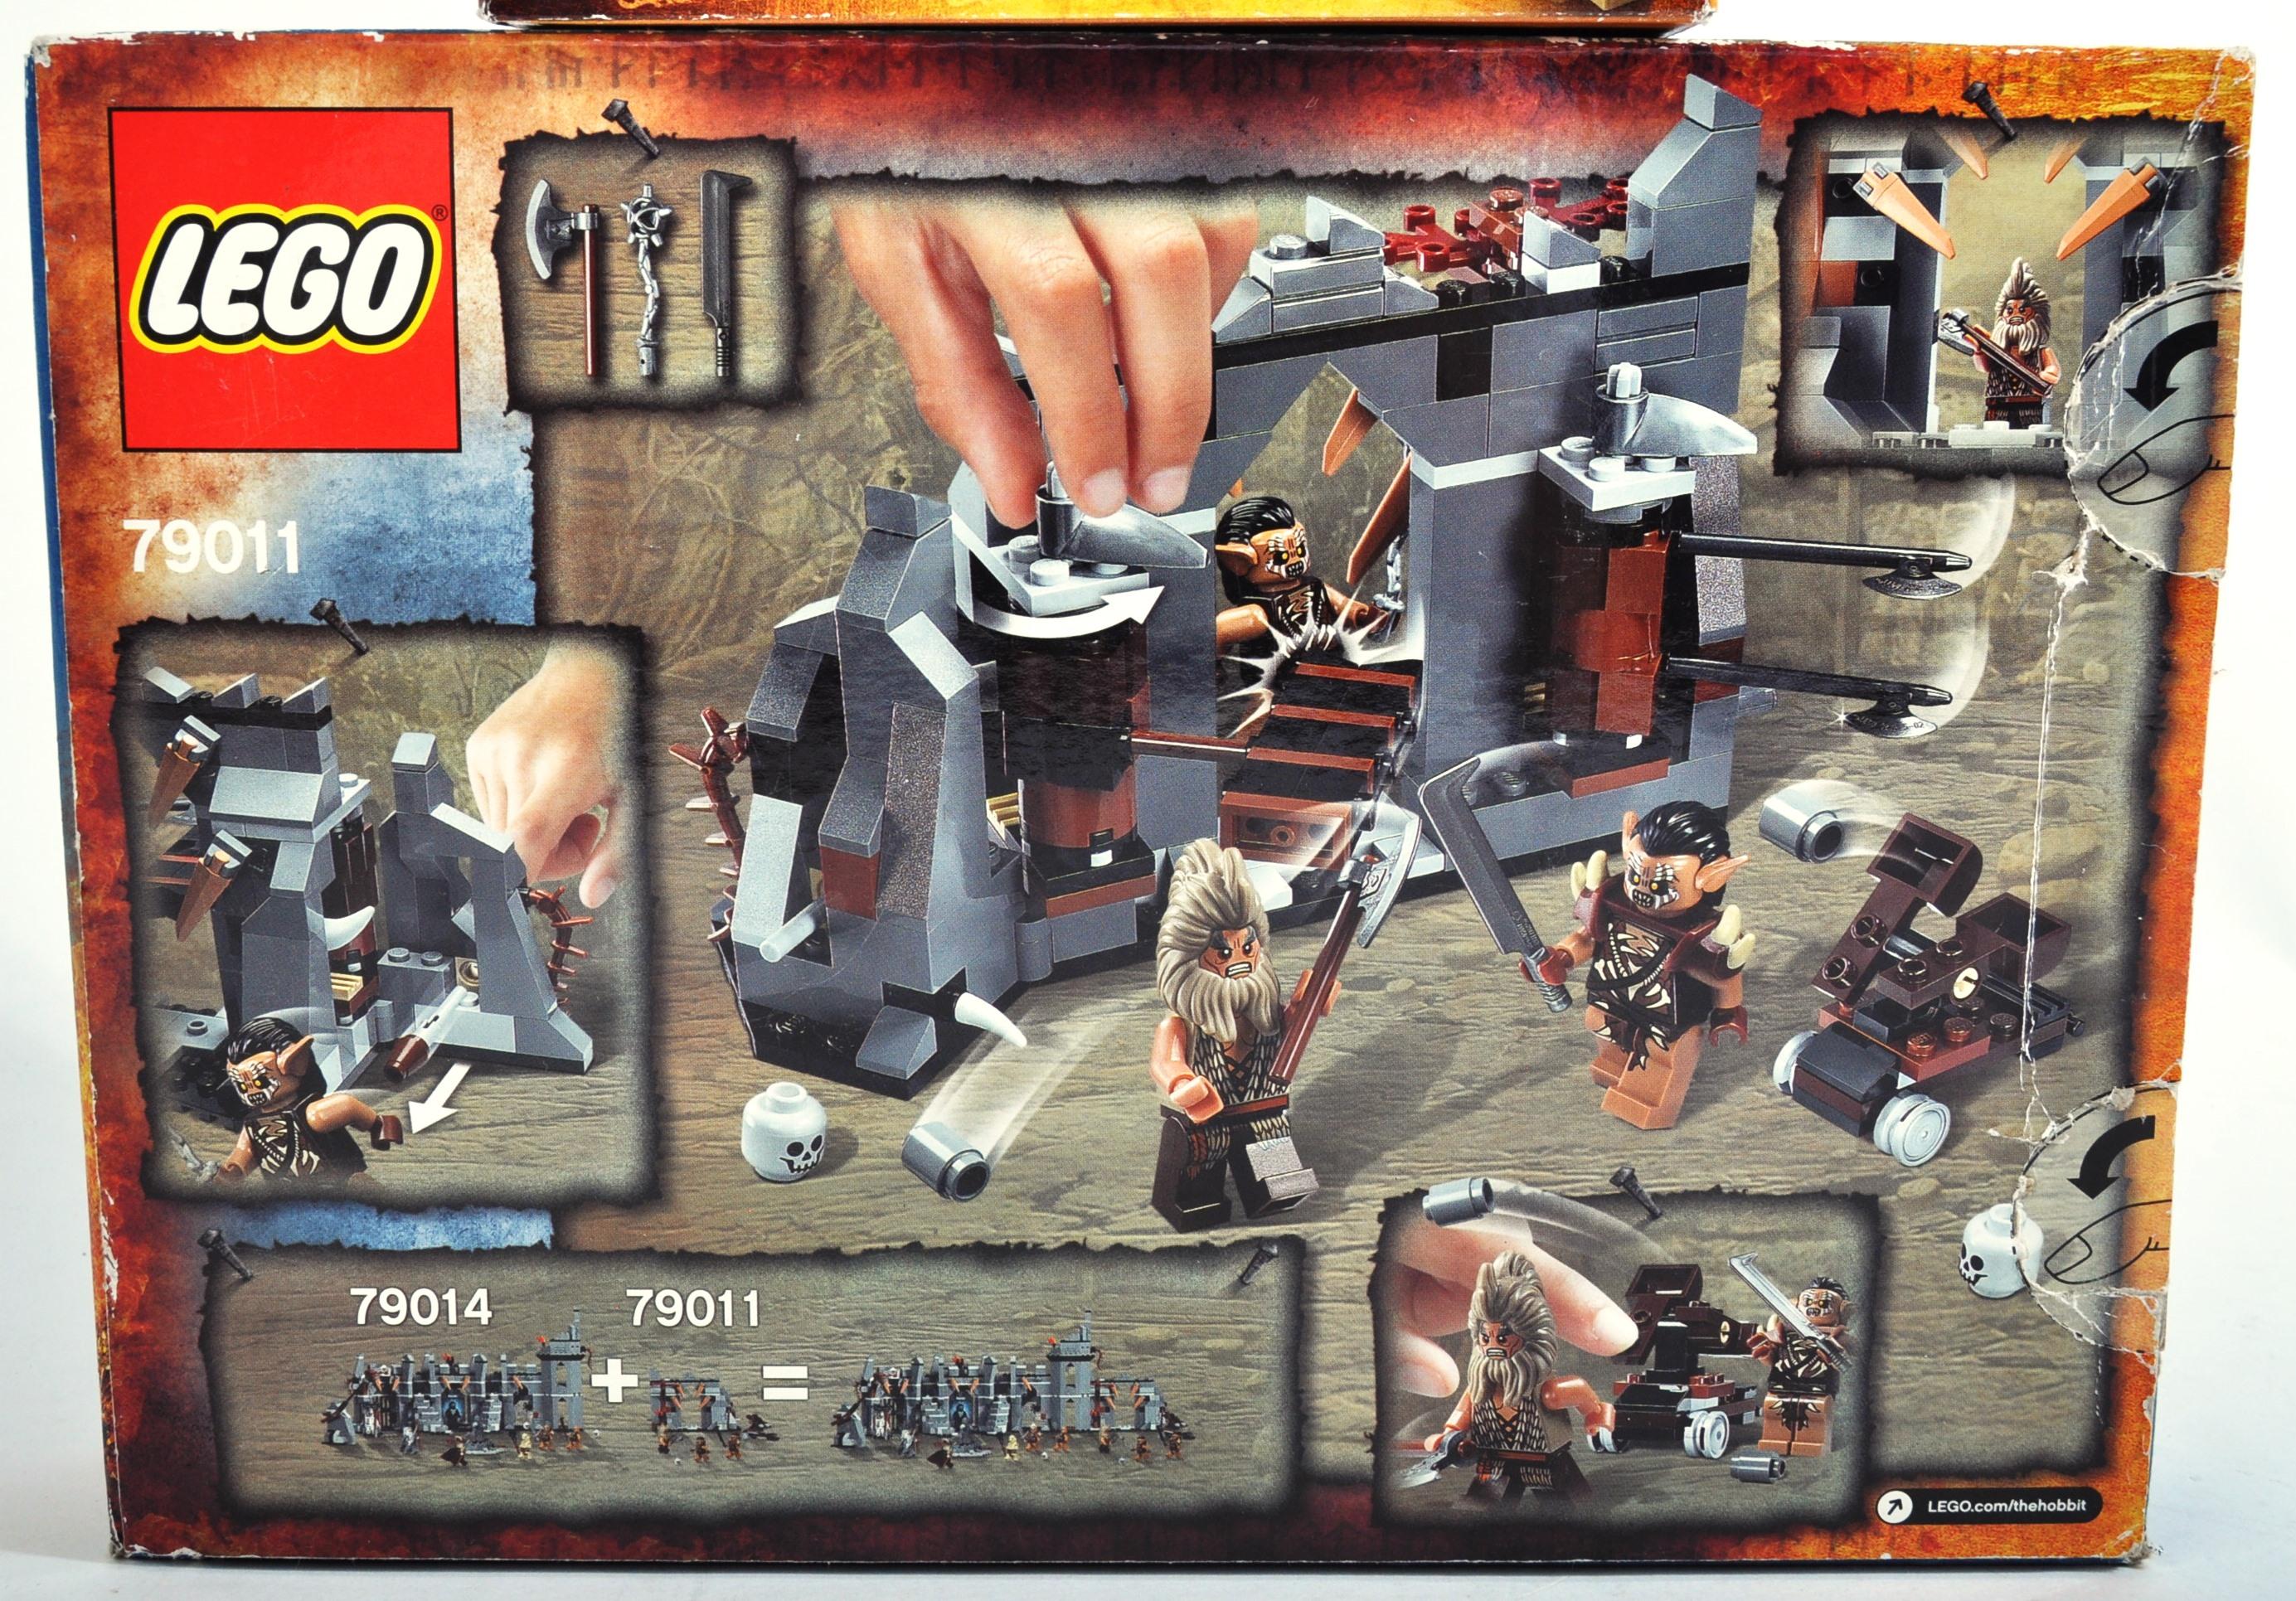 LEGO SETS - THE HOBBIT - 79000 / 79011 - Image 3 of 7